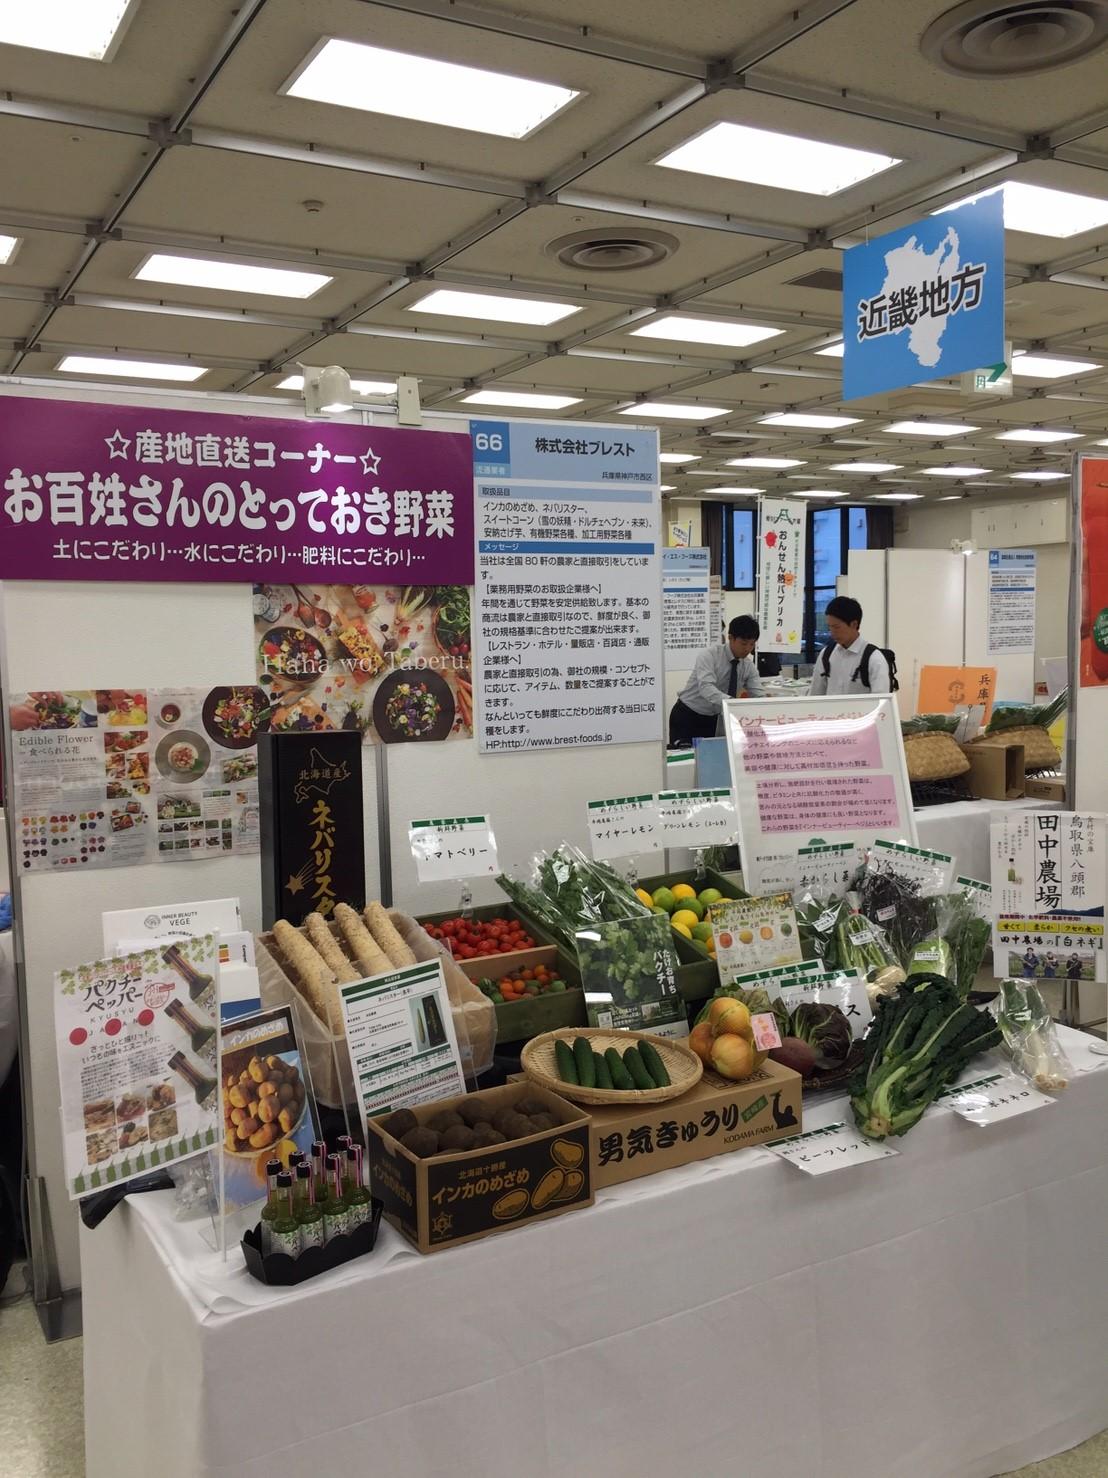 第27回加工・業務用野菜産地と実需要者との交流会(東京流通センター第二展示場)